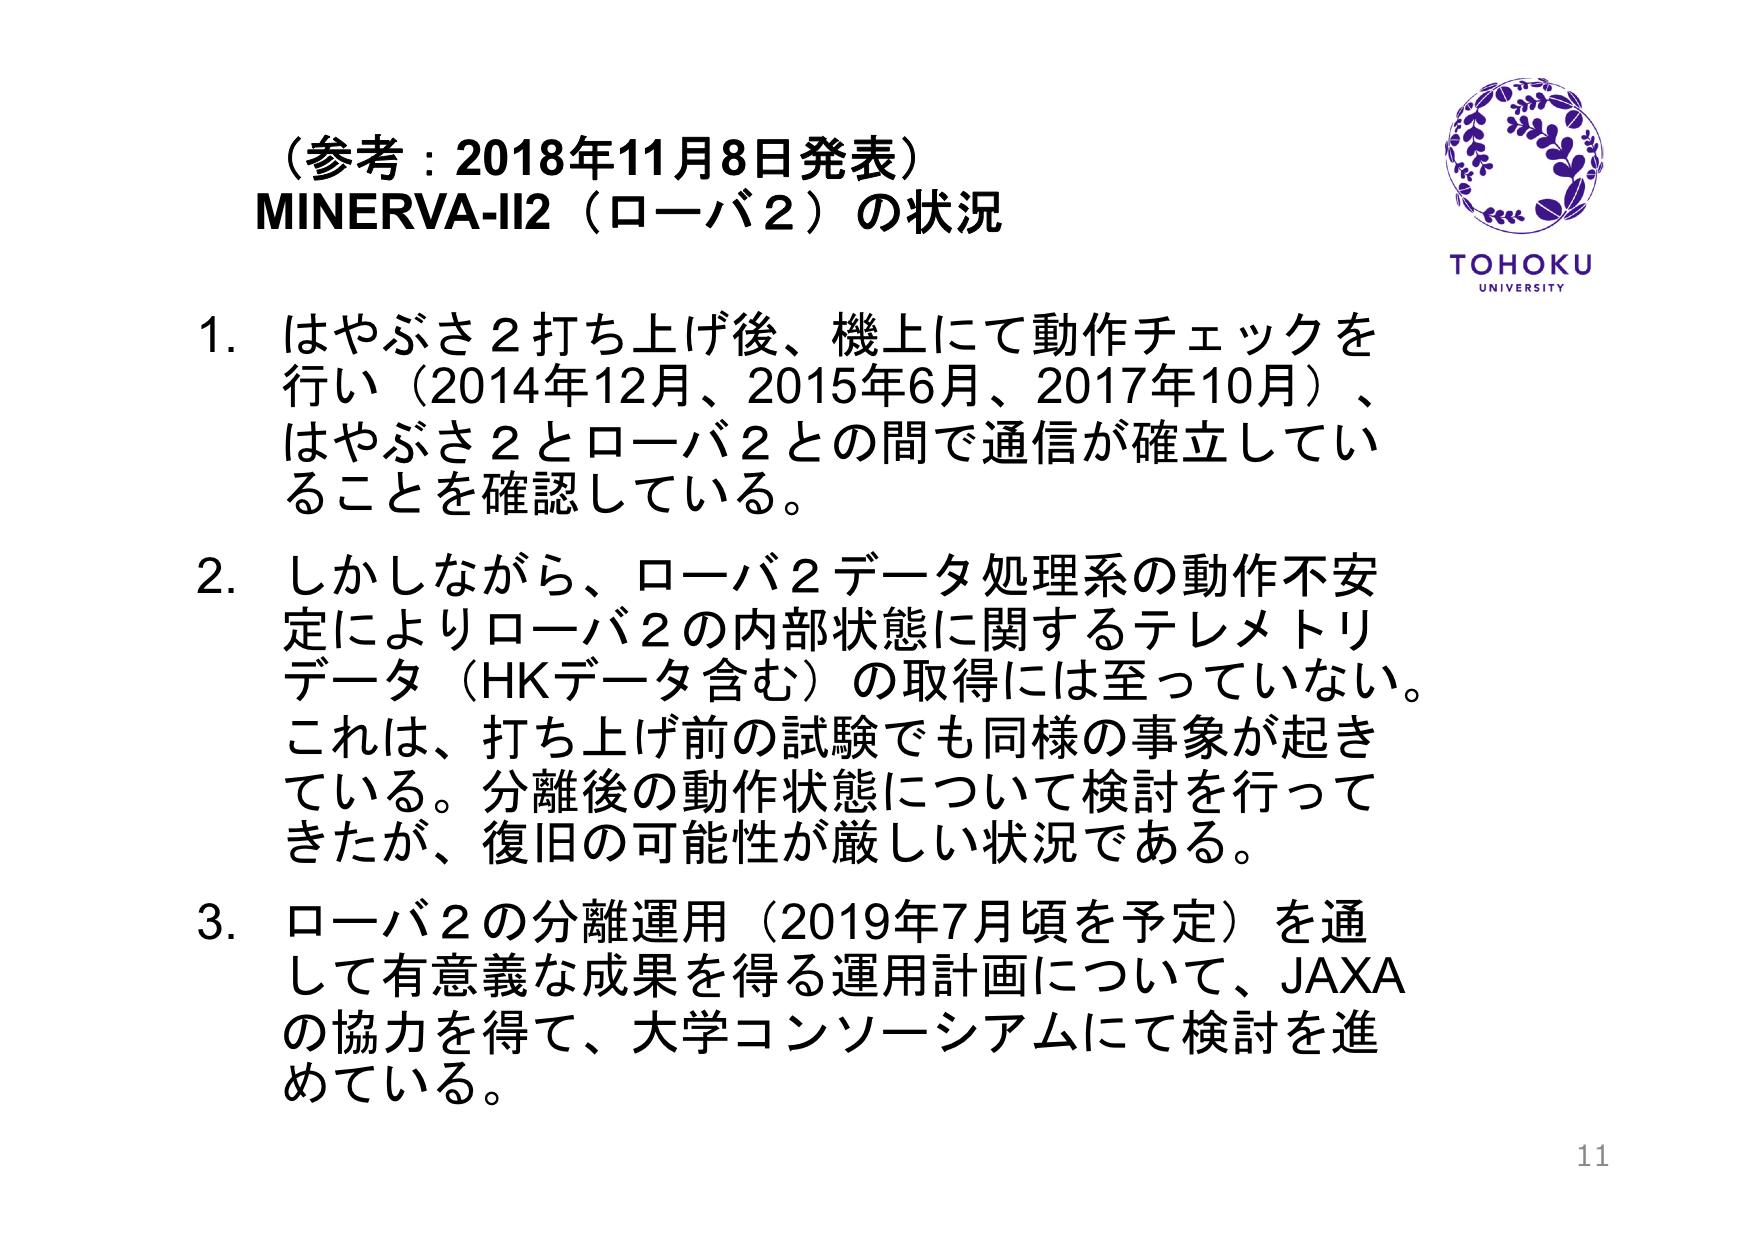 f:id:Imamura:20190924122741p:plain